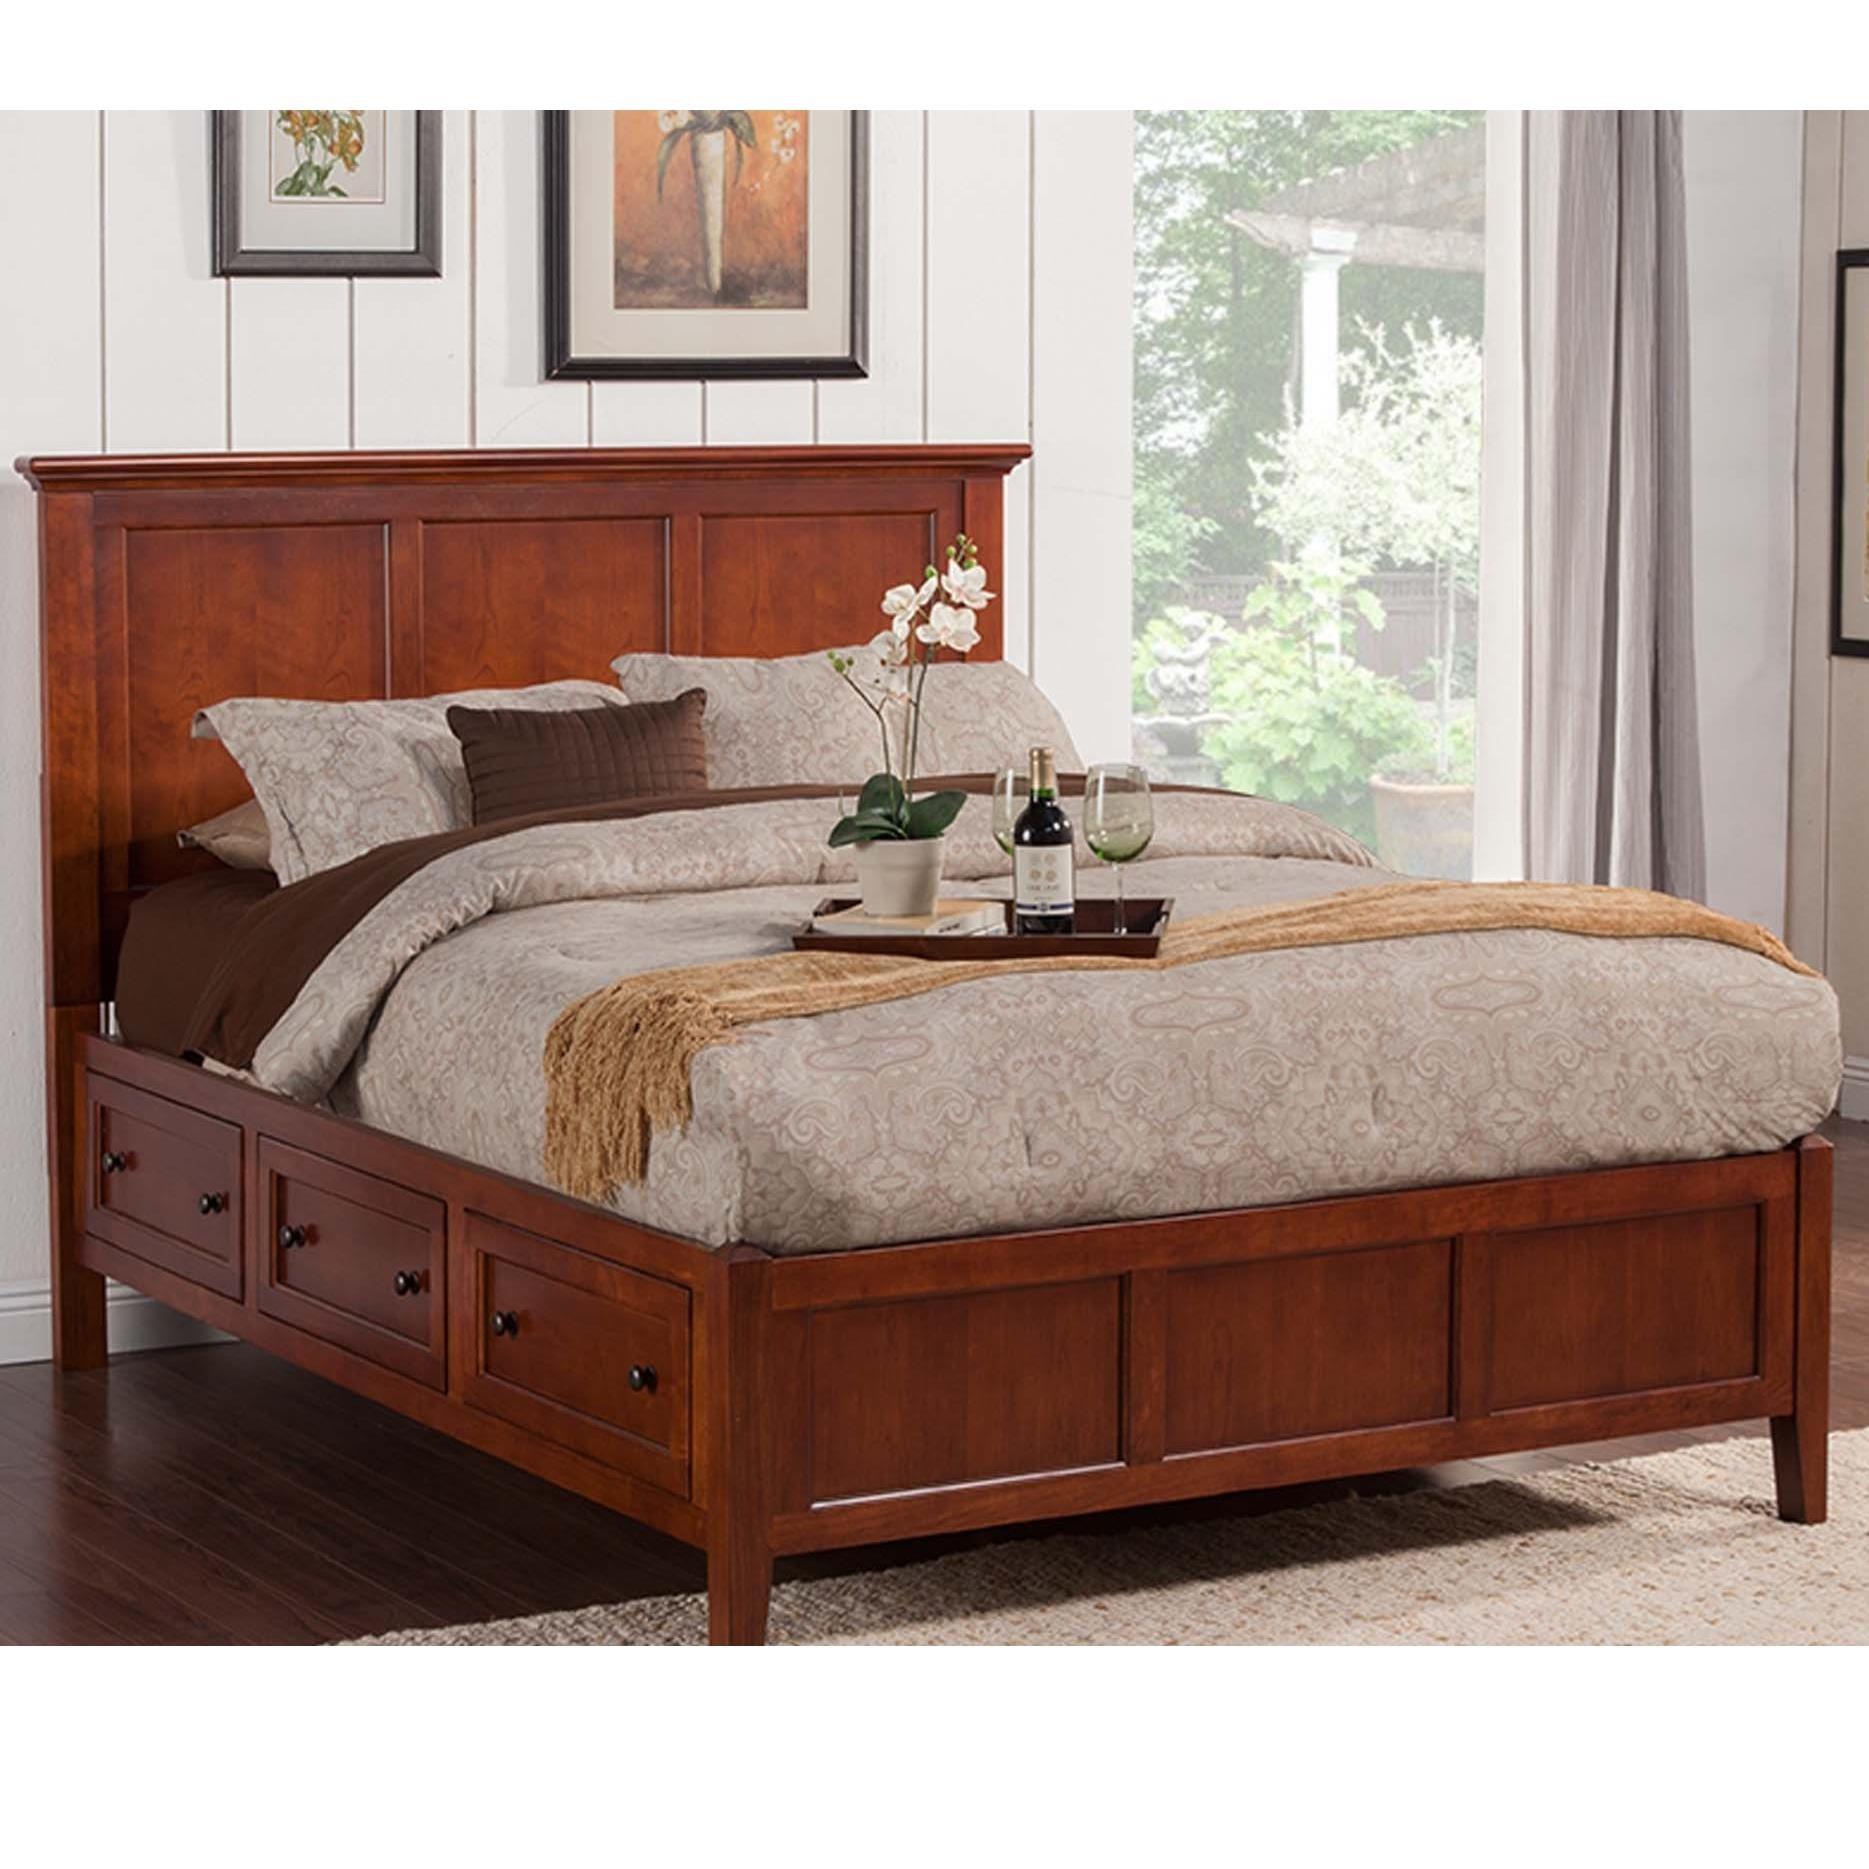 Ashley Furniture Flagstaff: Winners Only Flagstaff BFC1002QS 6 Drawer Queen Storage